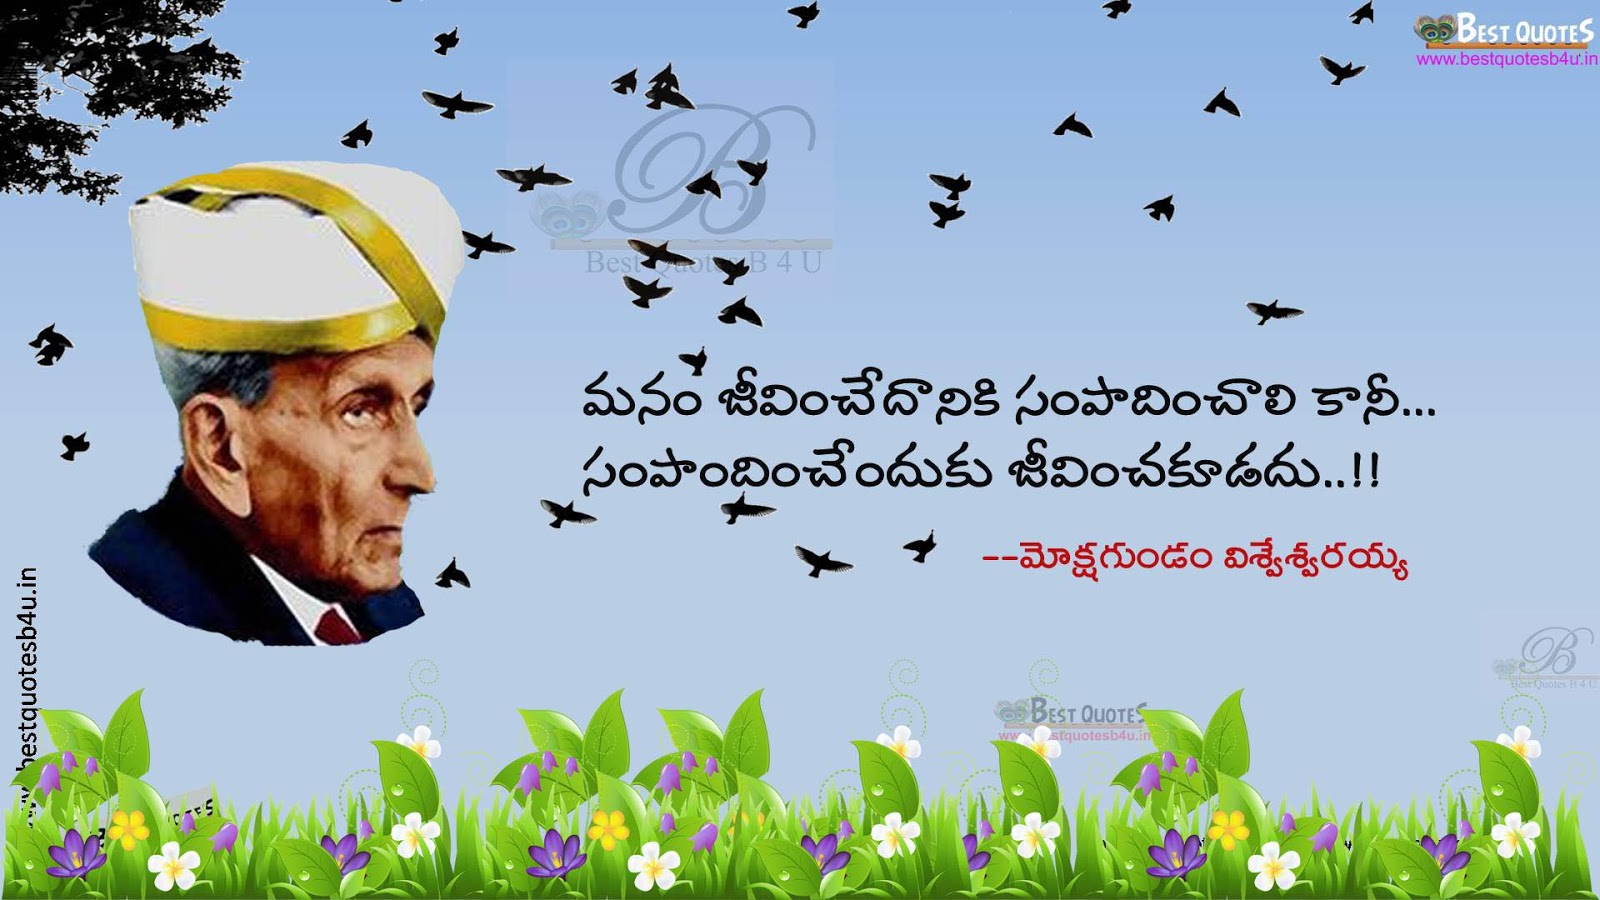 Best Inspirational Quotes In Telugu Bestquotesb4u English